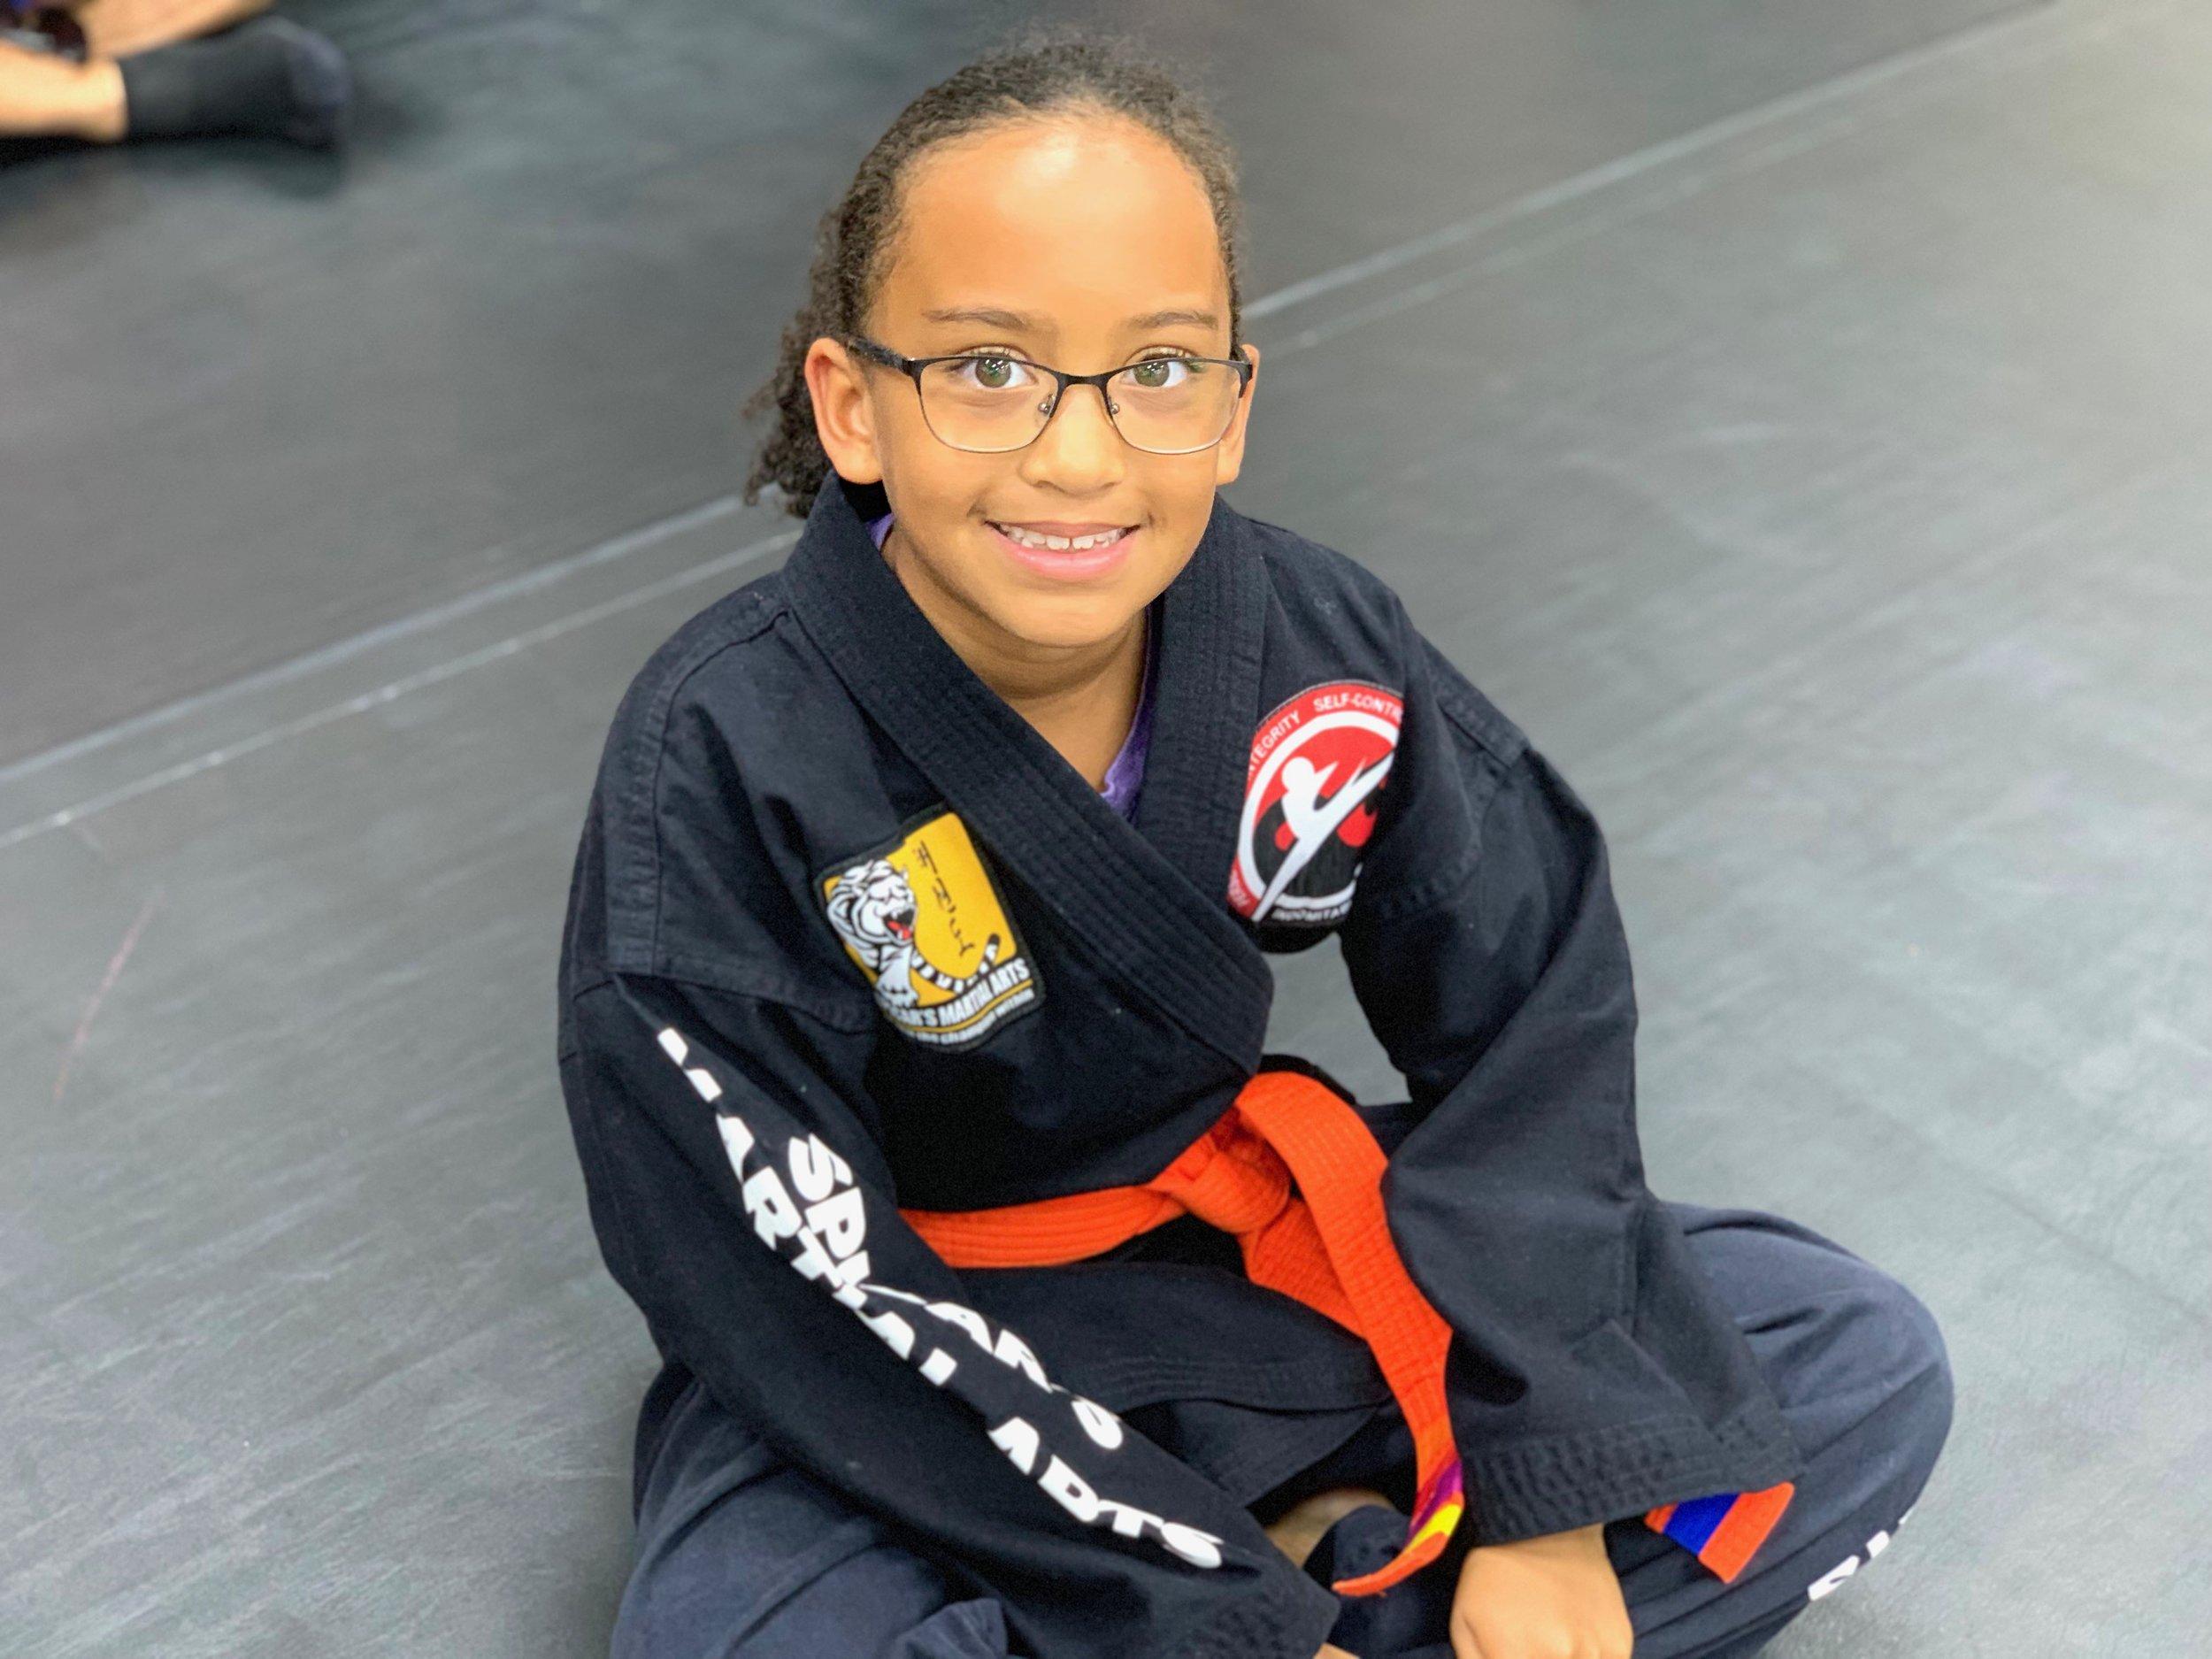 karate-kids-program-souhtlake-keller-grapevine-texas00007.jpeg